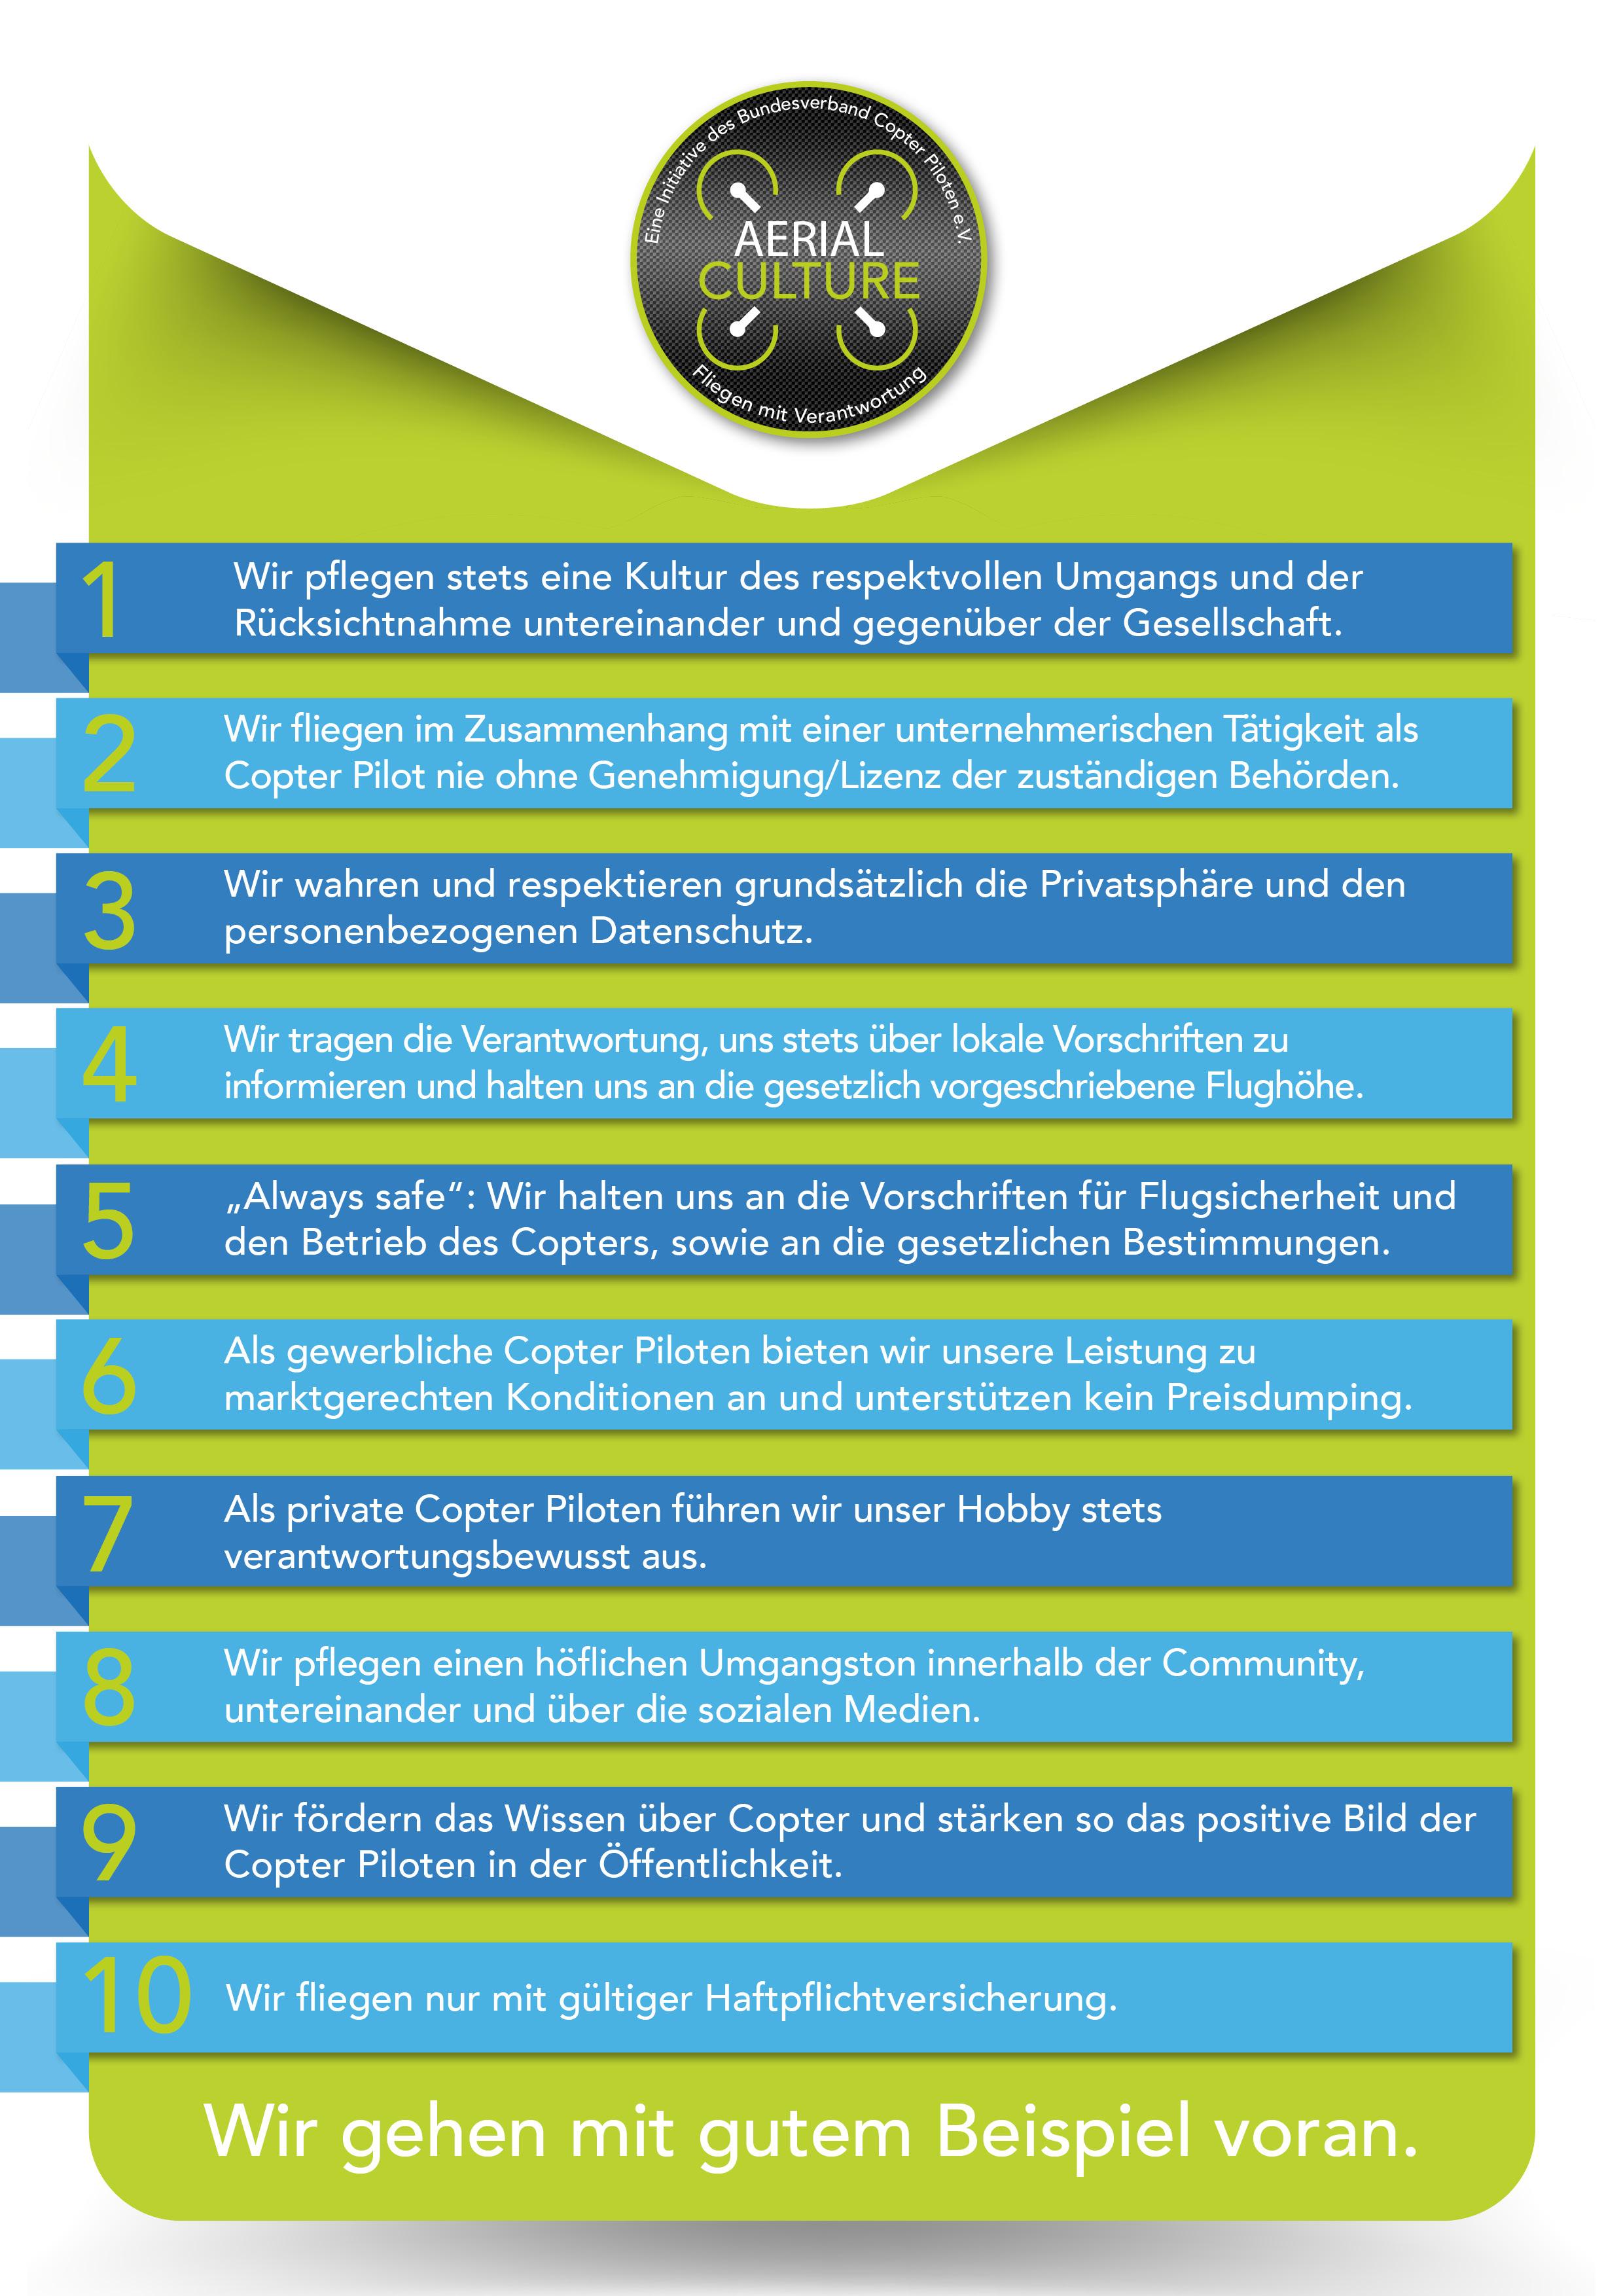 Aerial Culture Regeln (BVCP)